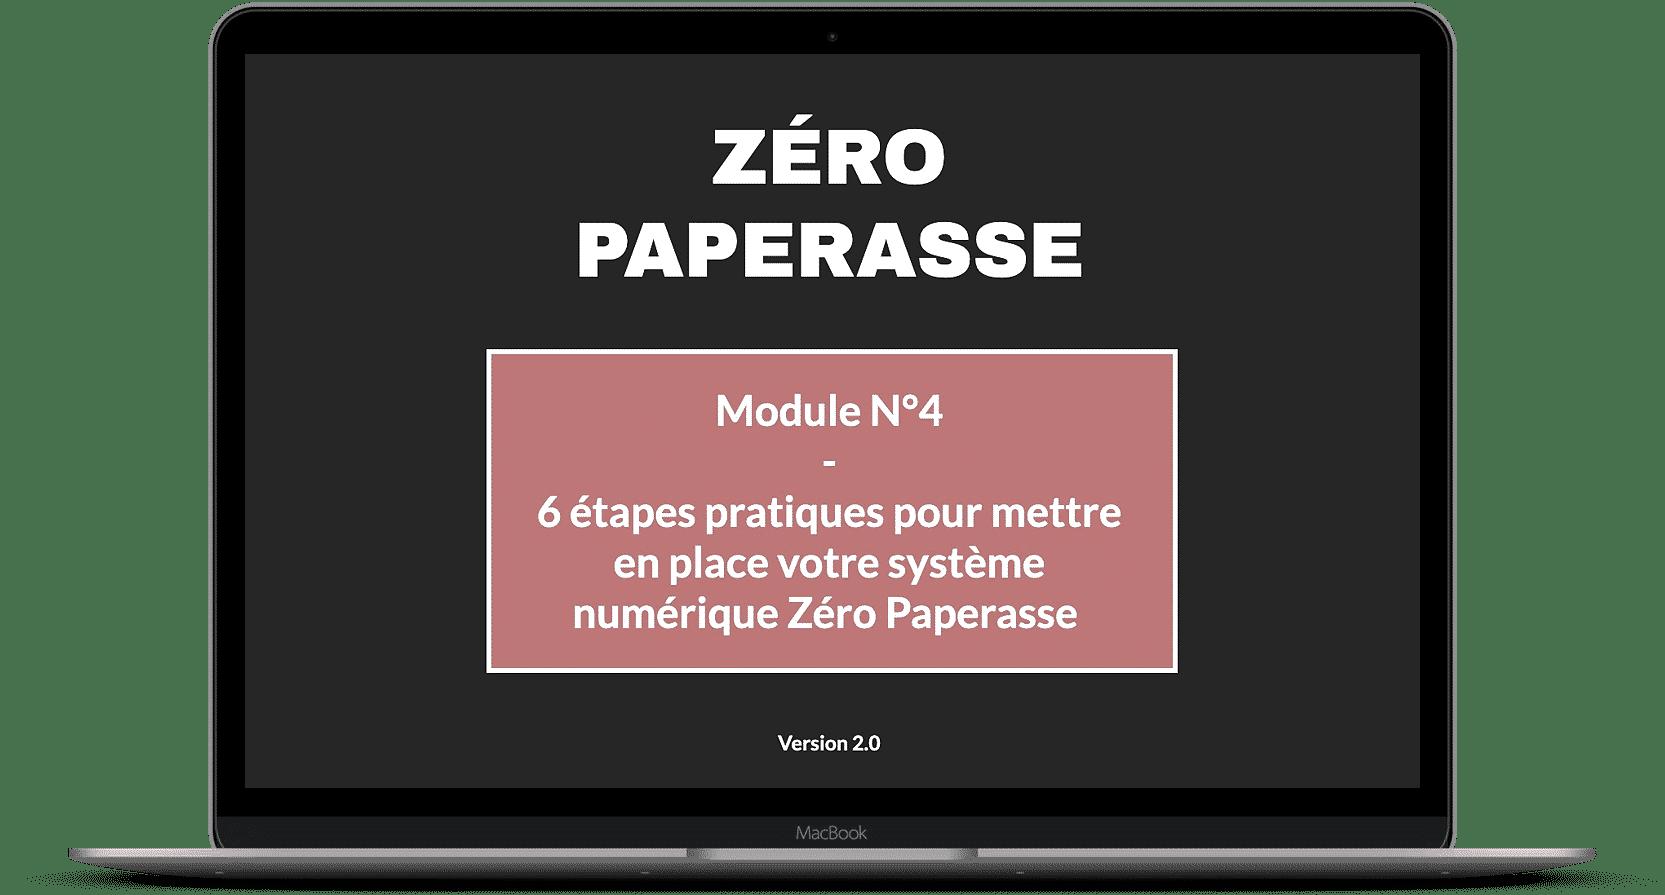 Zéro paperasse module 4